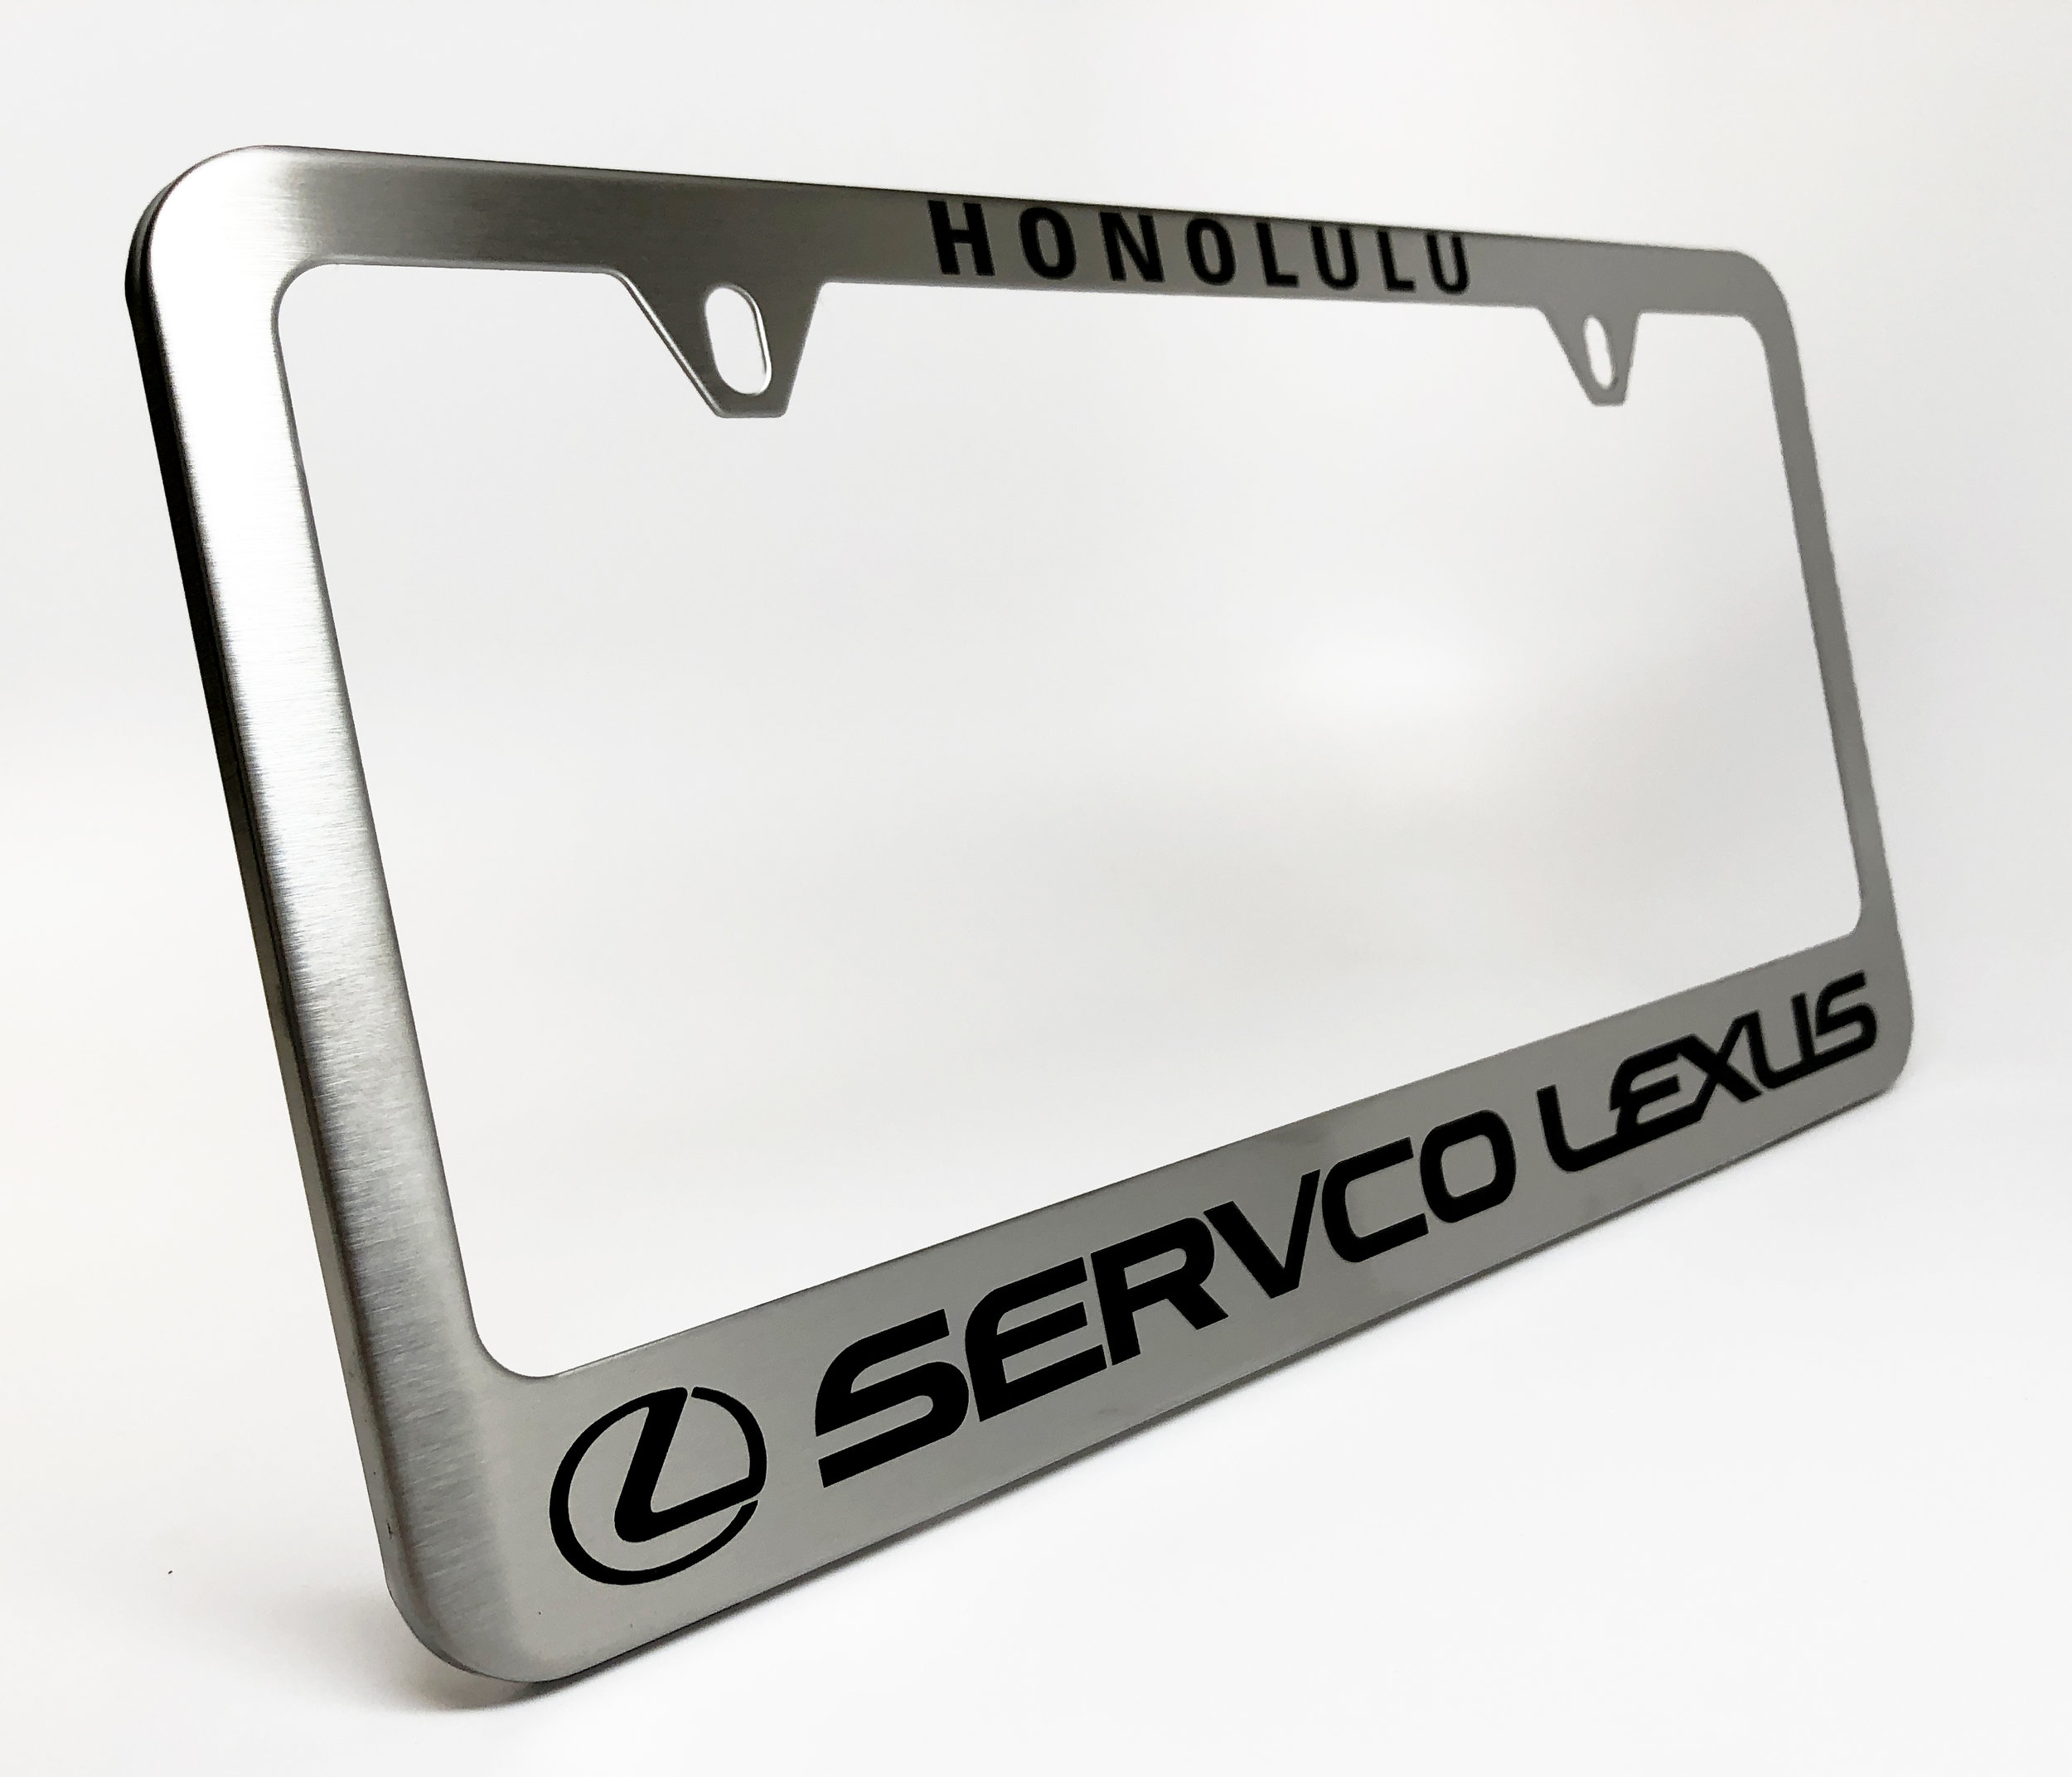 Camisasca Automotive Servco Lexus Honolulu License Plate Frame